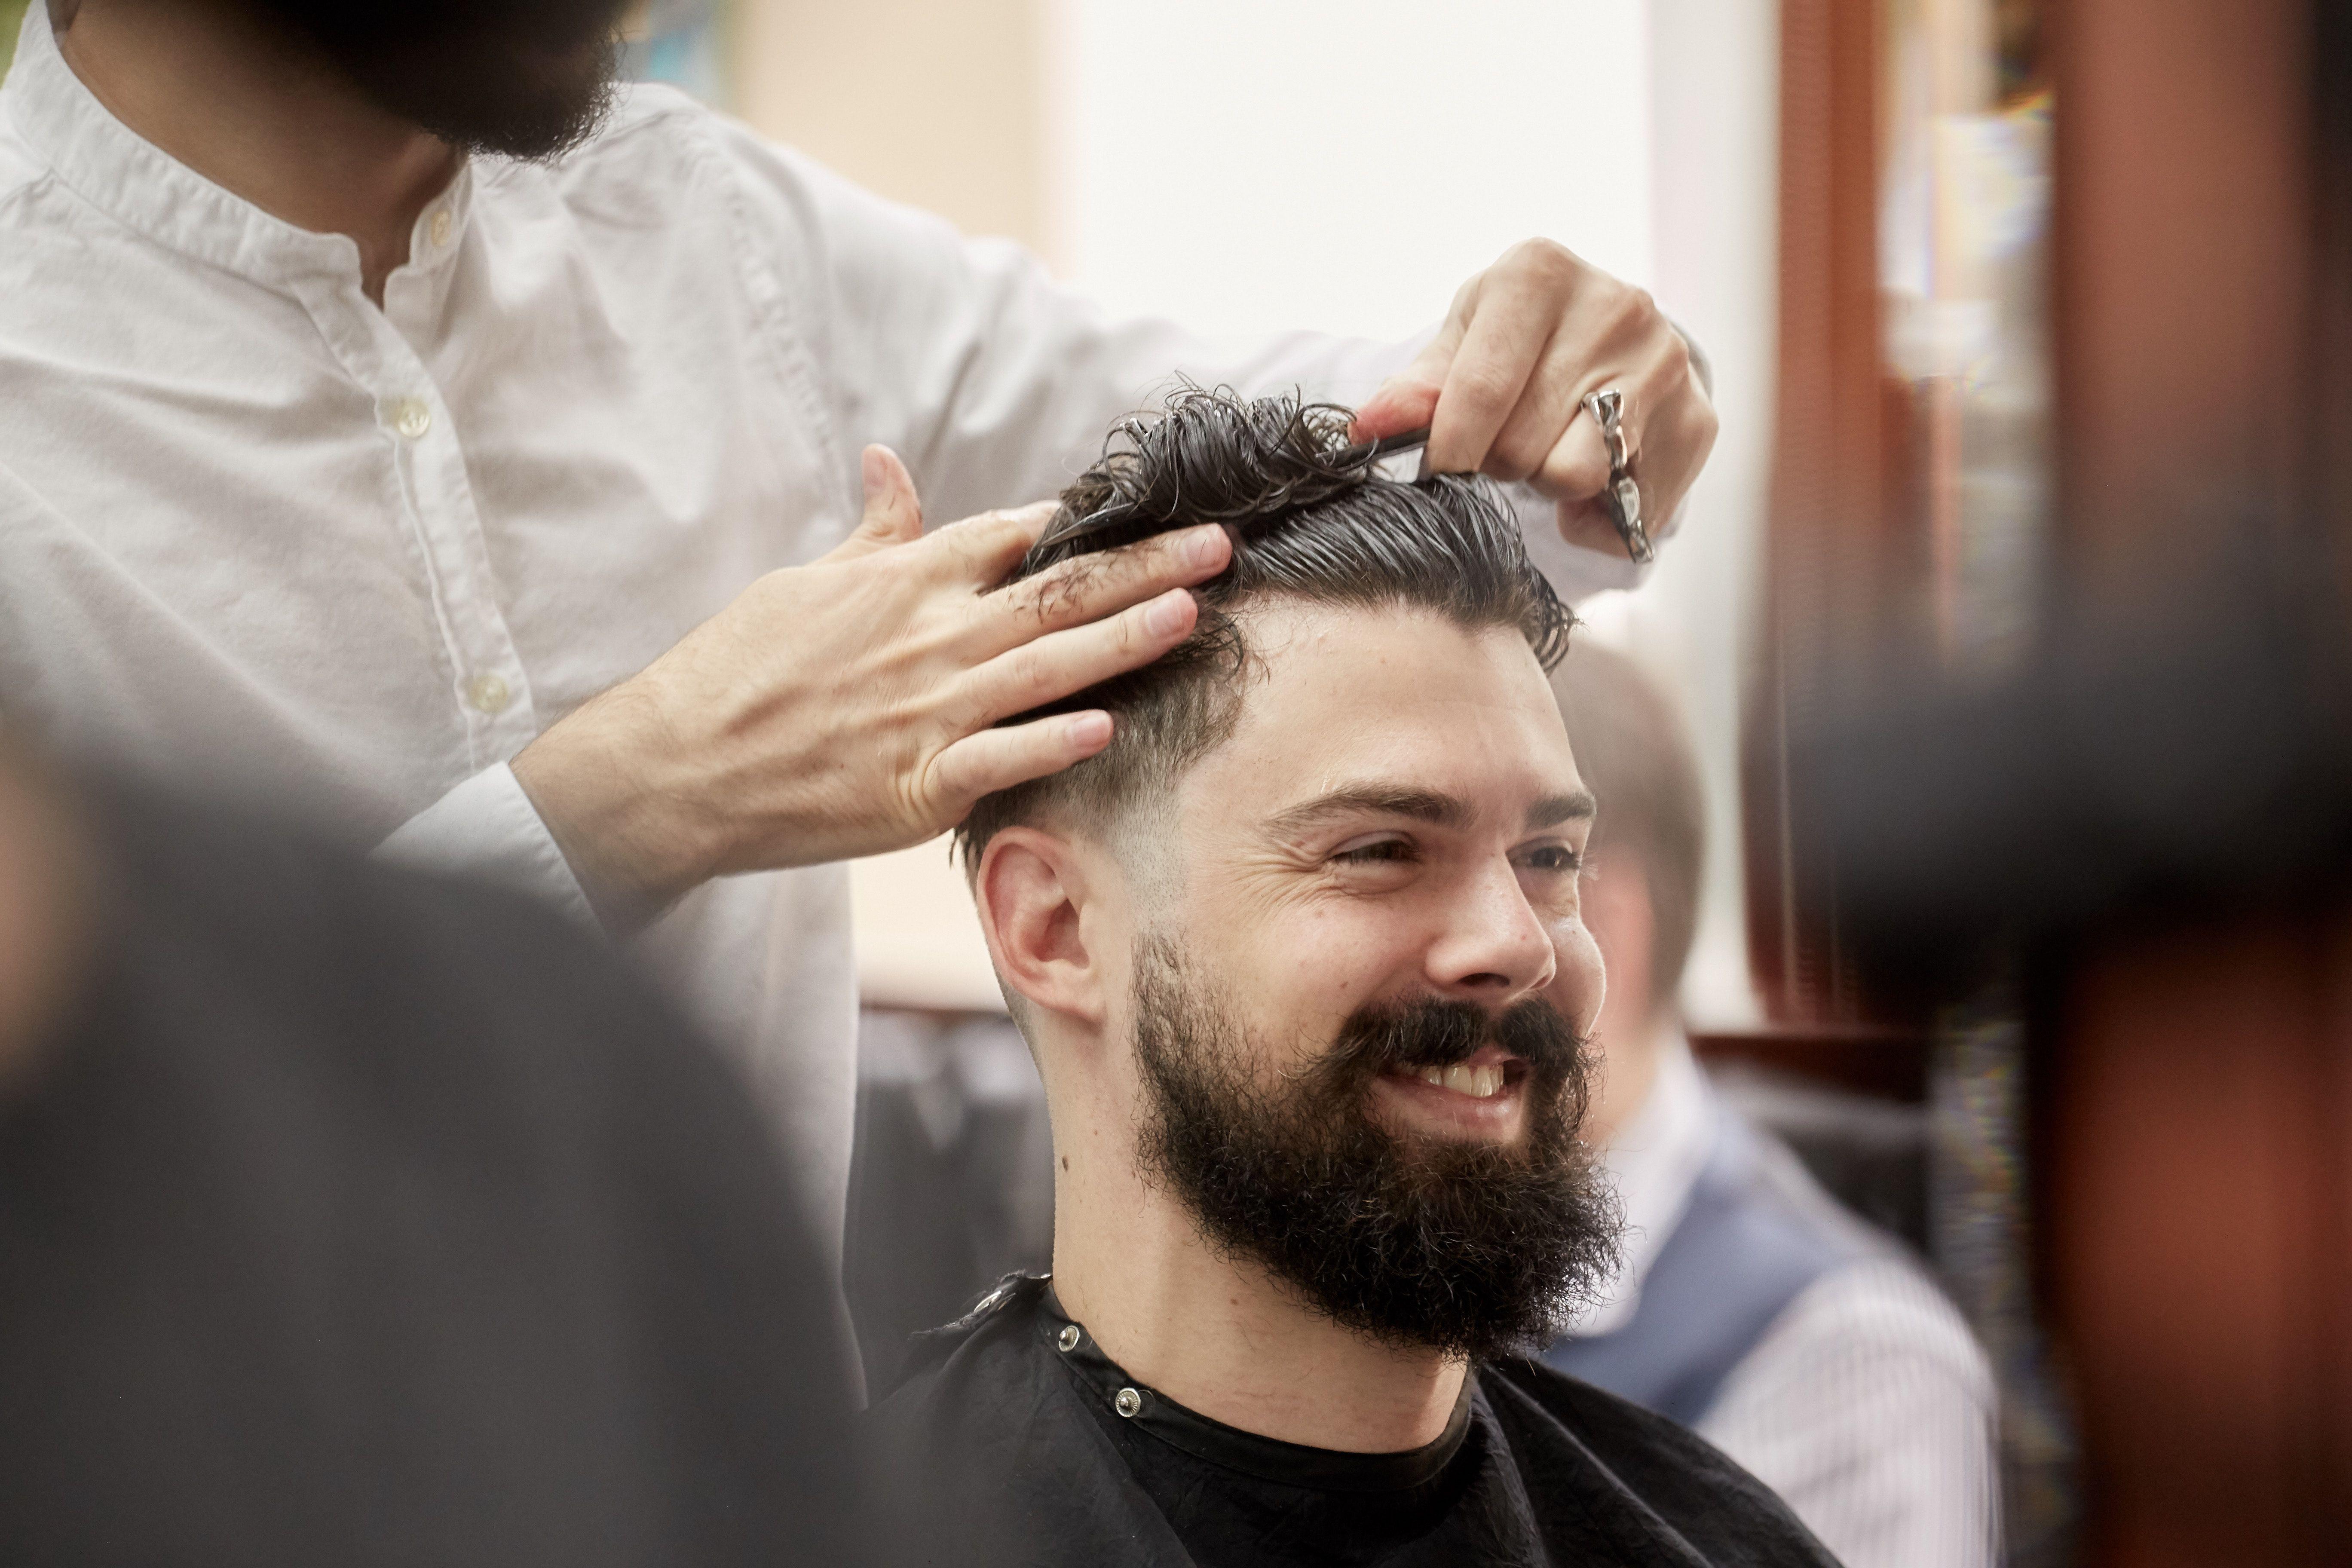 Barber Shop Nyc Barbers Nyc Pall Mall Barbers Midtown Nyc Best Barbers Midtown Rockefeller In 2020 Best Barber Barber Near Me Barber London